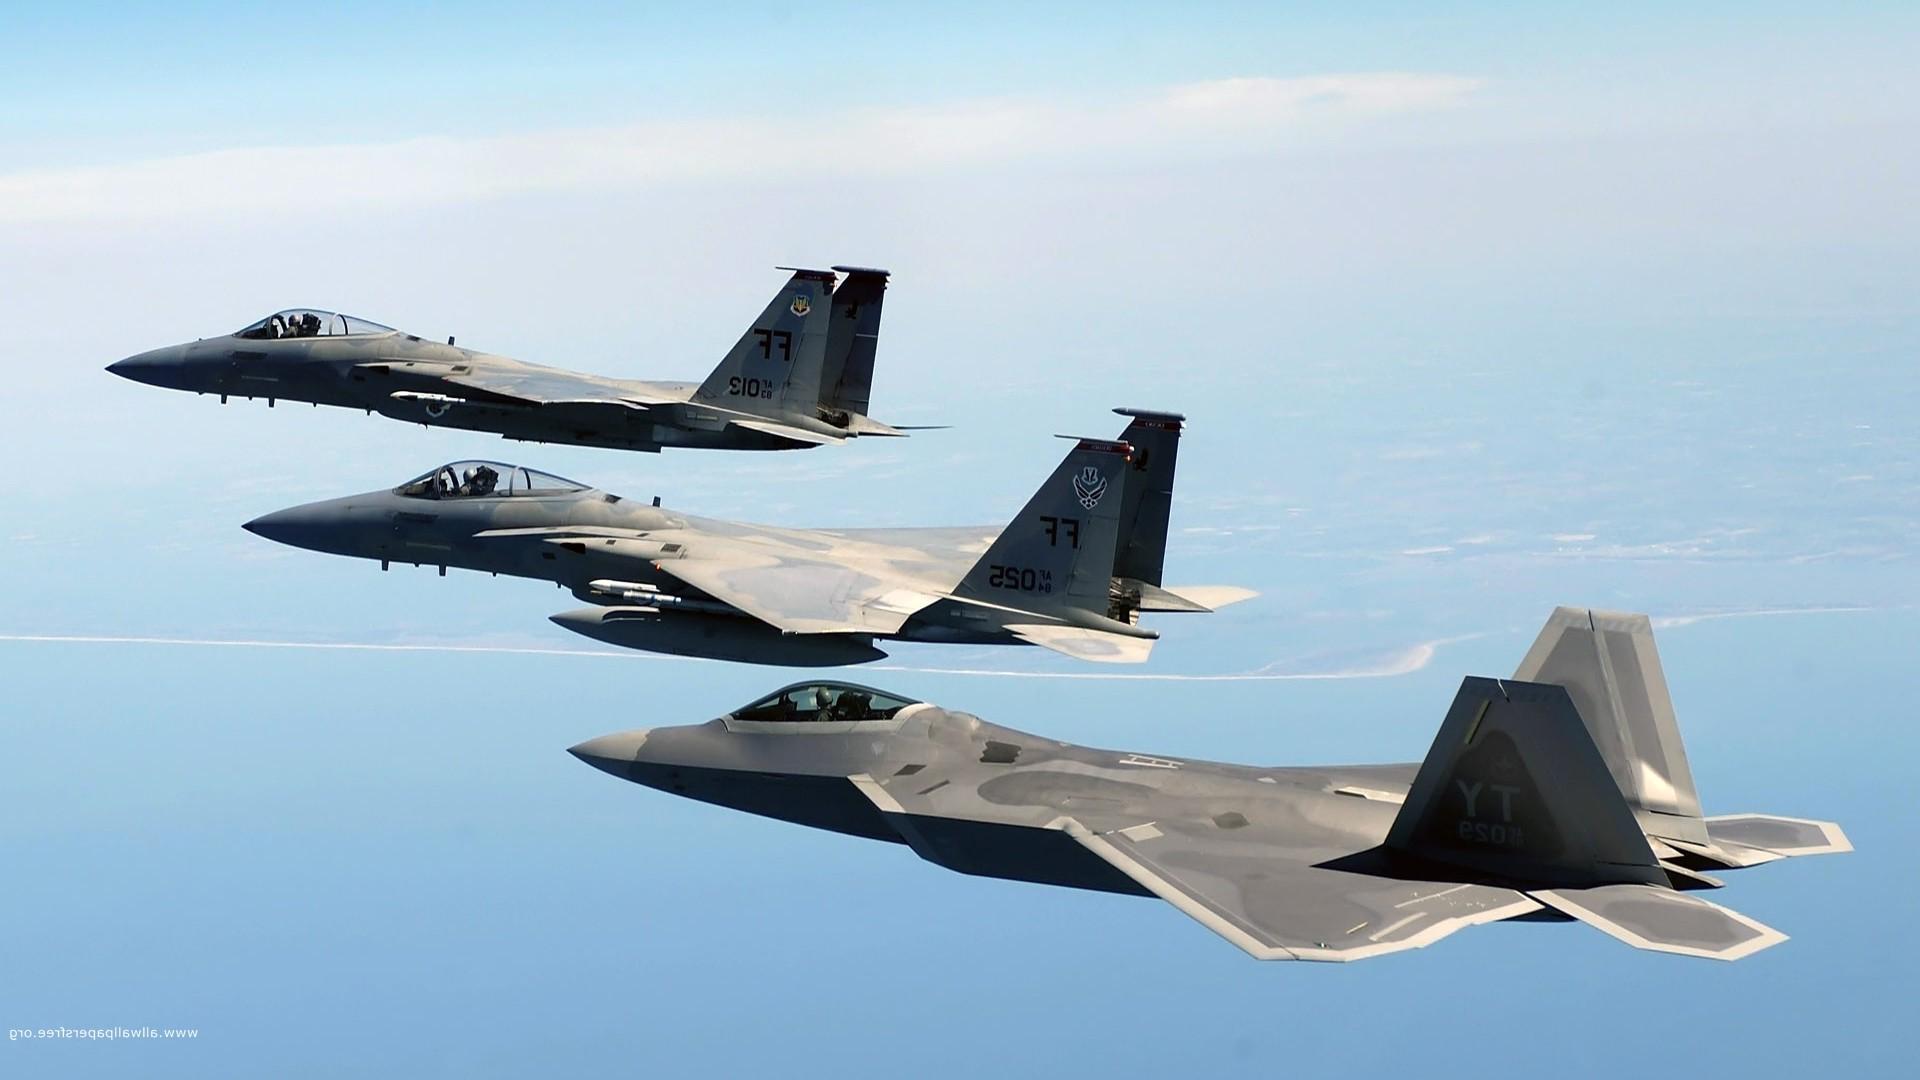 wallpaper : airplane, military aircraft, lockheed martin f 22 raptor